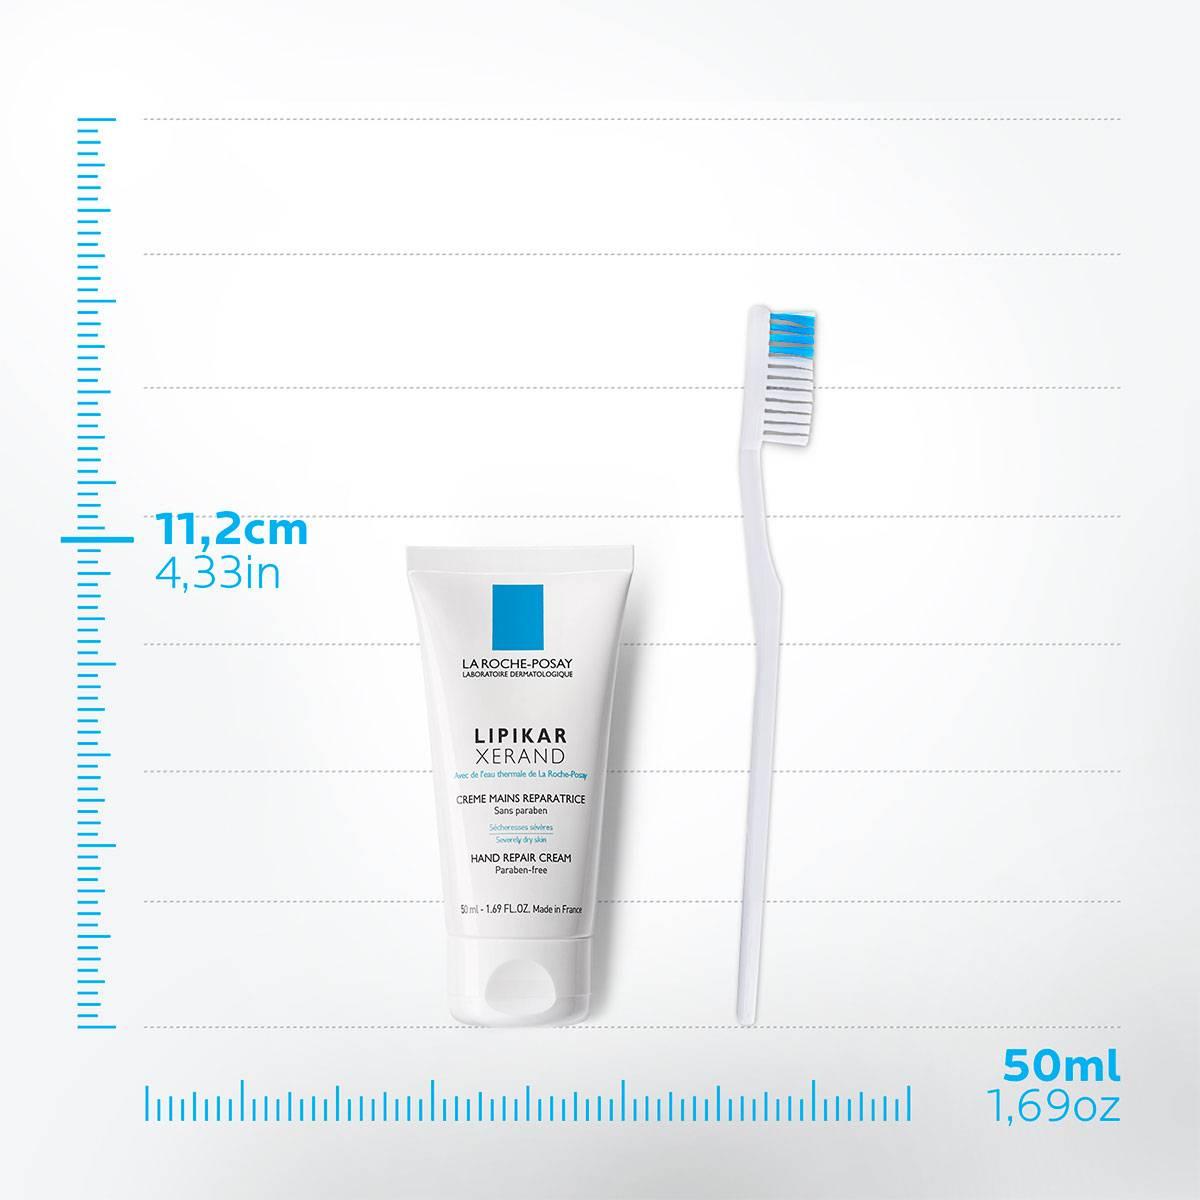 La Roche Posay ProduktSide Eksem Lipikar Xerand 50ml 3337872412684